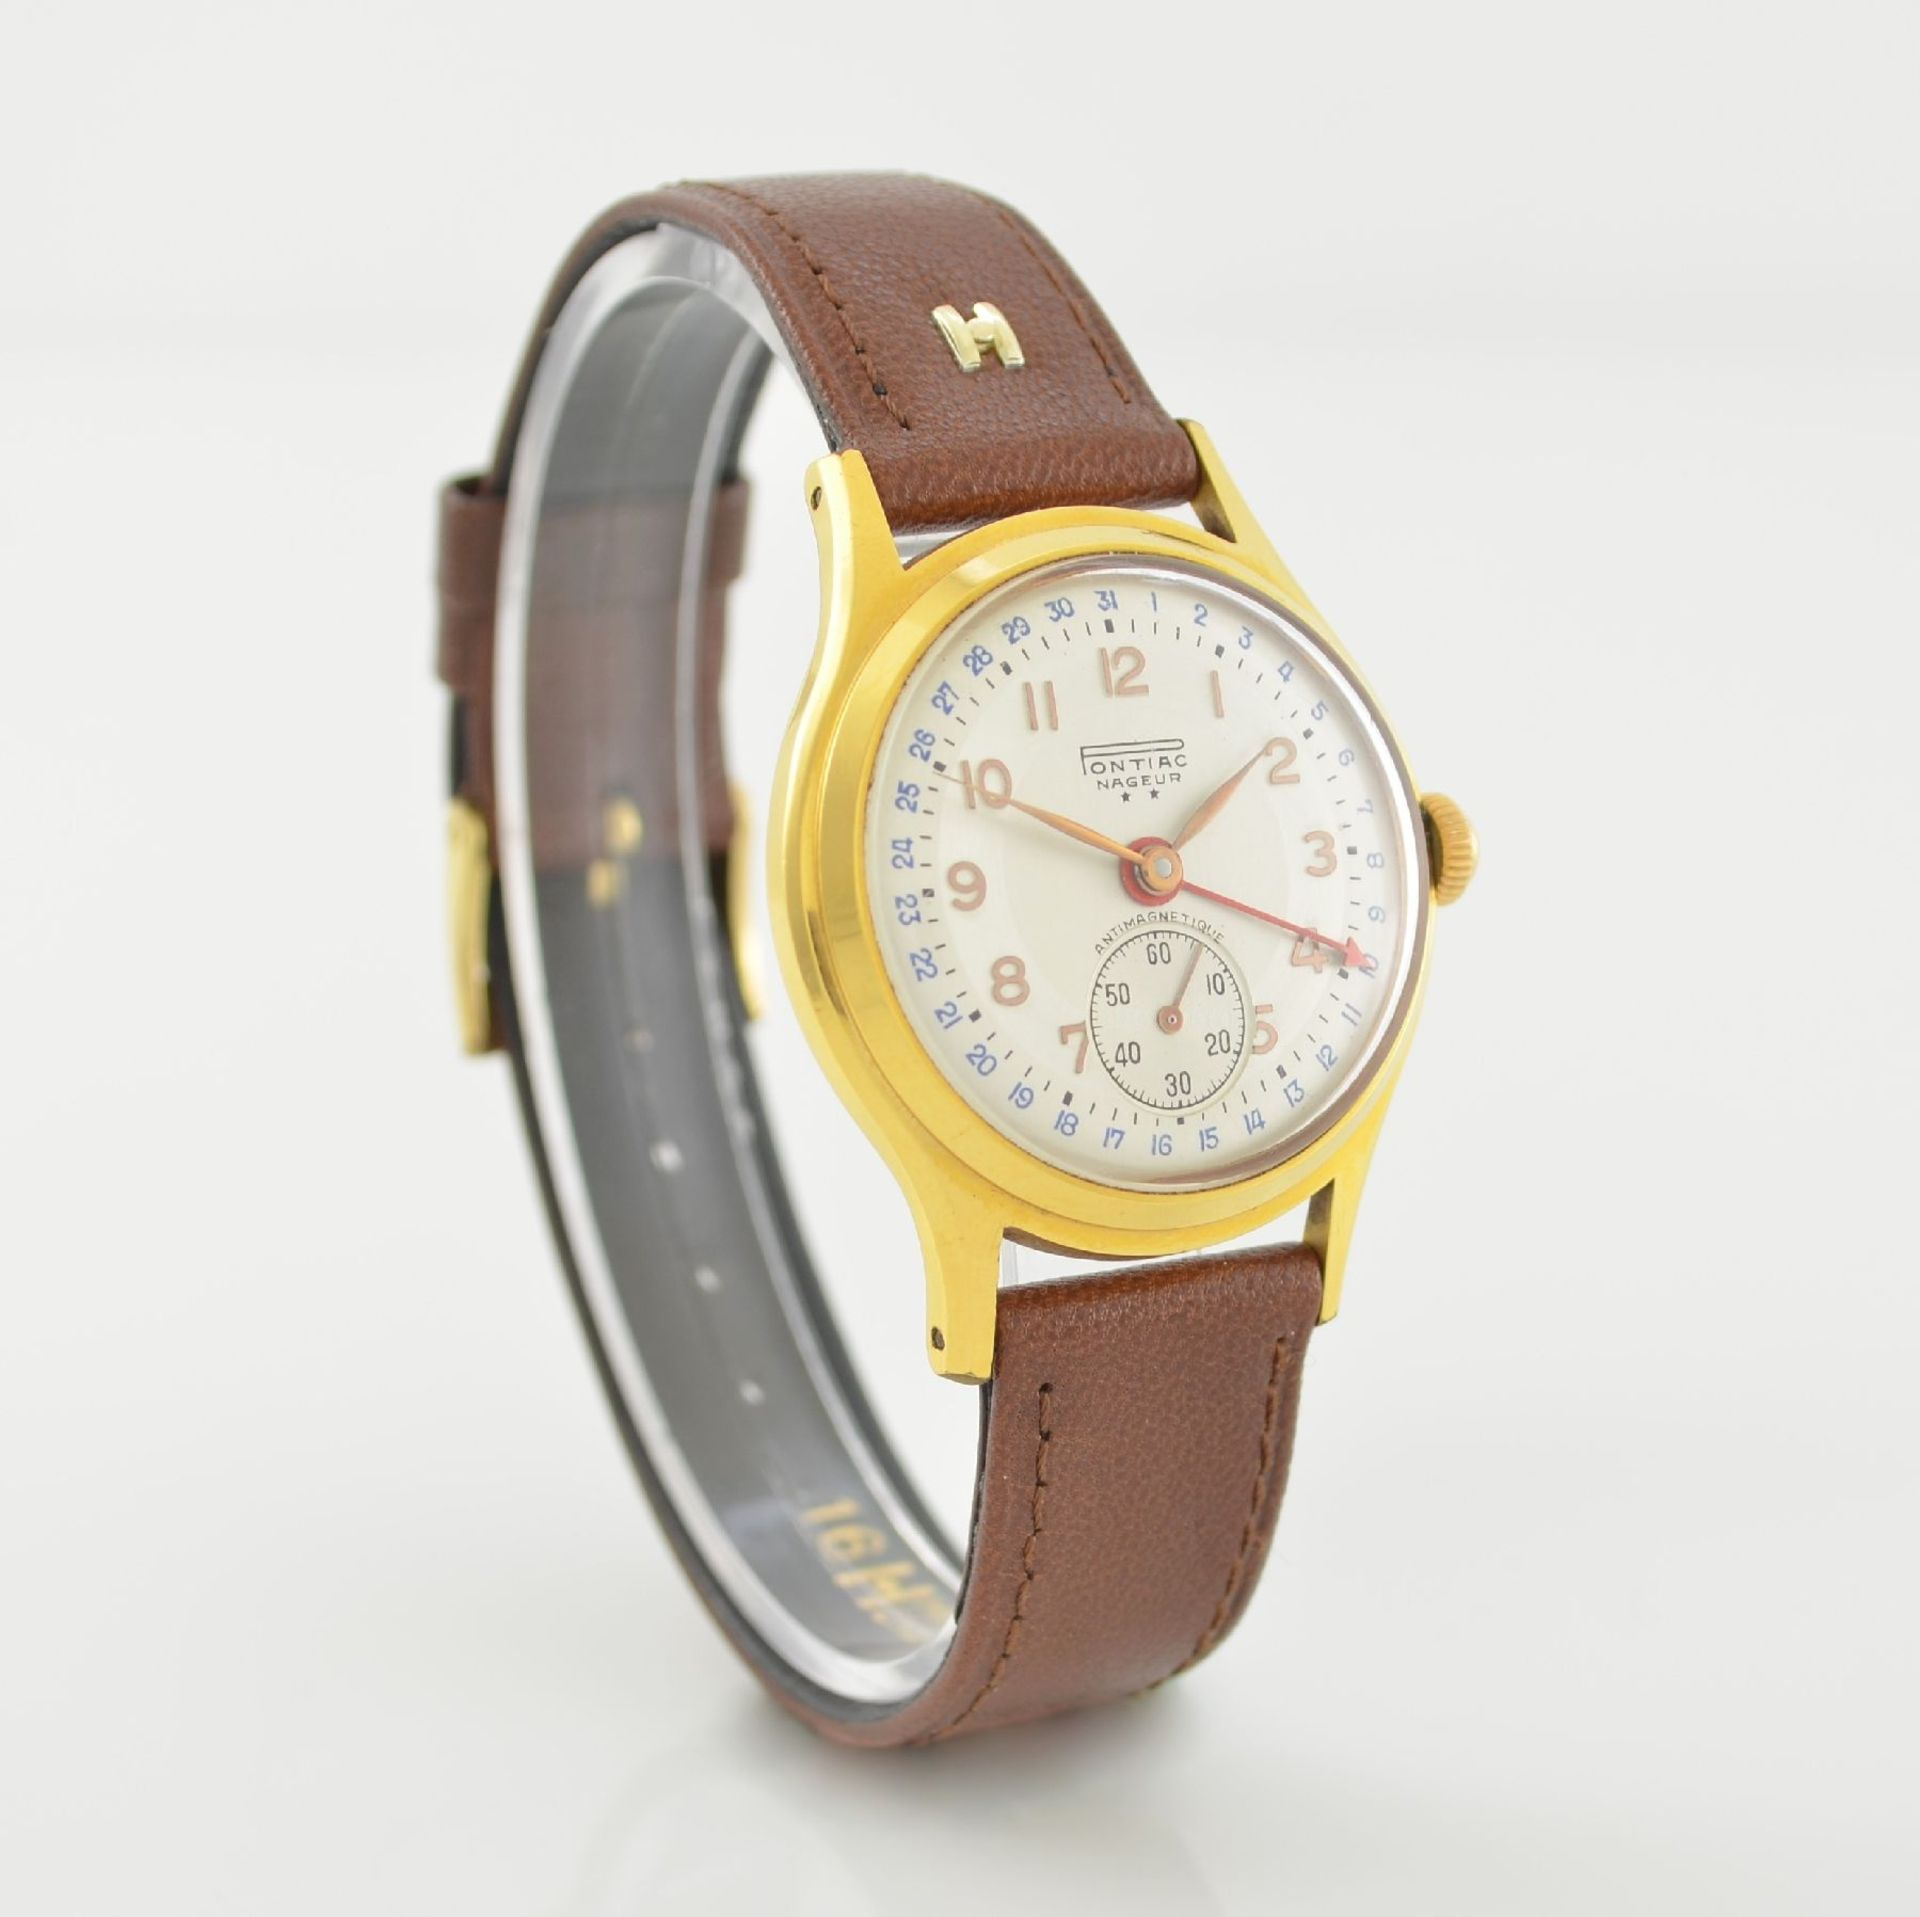 Konvolut: 2 Armbanduhren mit Kalender bzw. Datum, Schweiz um 1950-1960, Handaufzug, 1) NACAR m. - Bild 10 aus 12